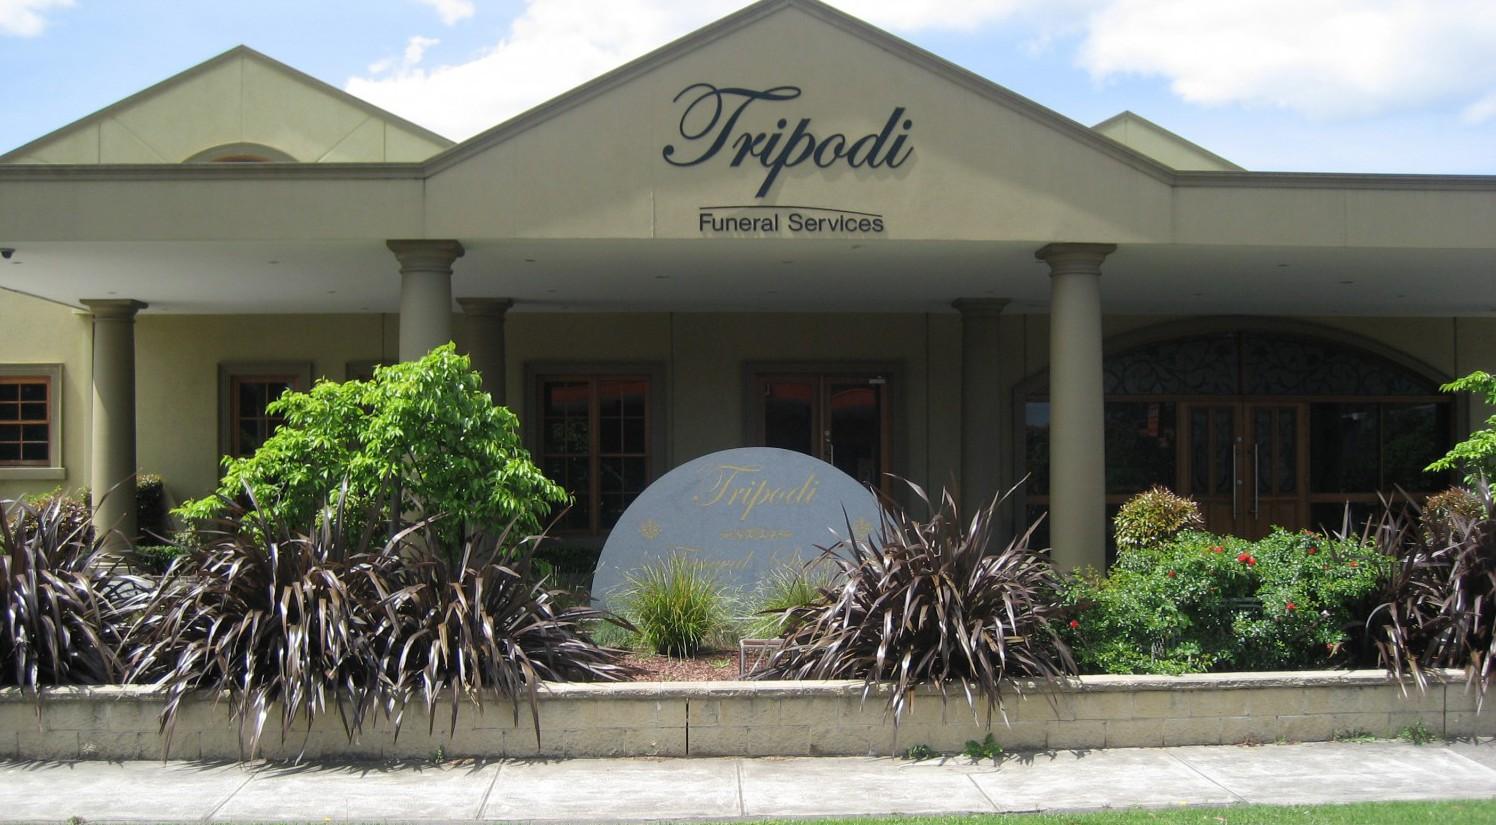 Tripodi Funeral Services